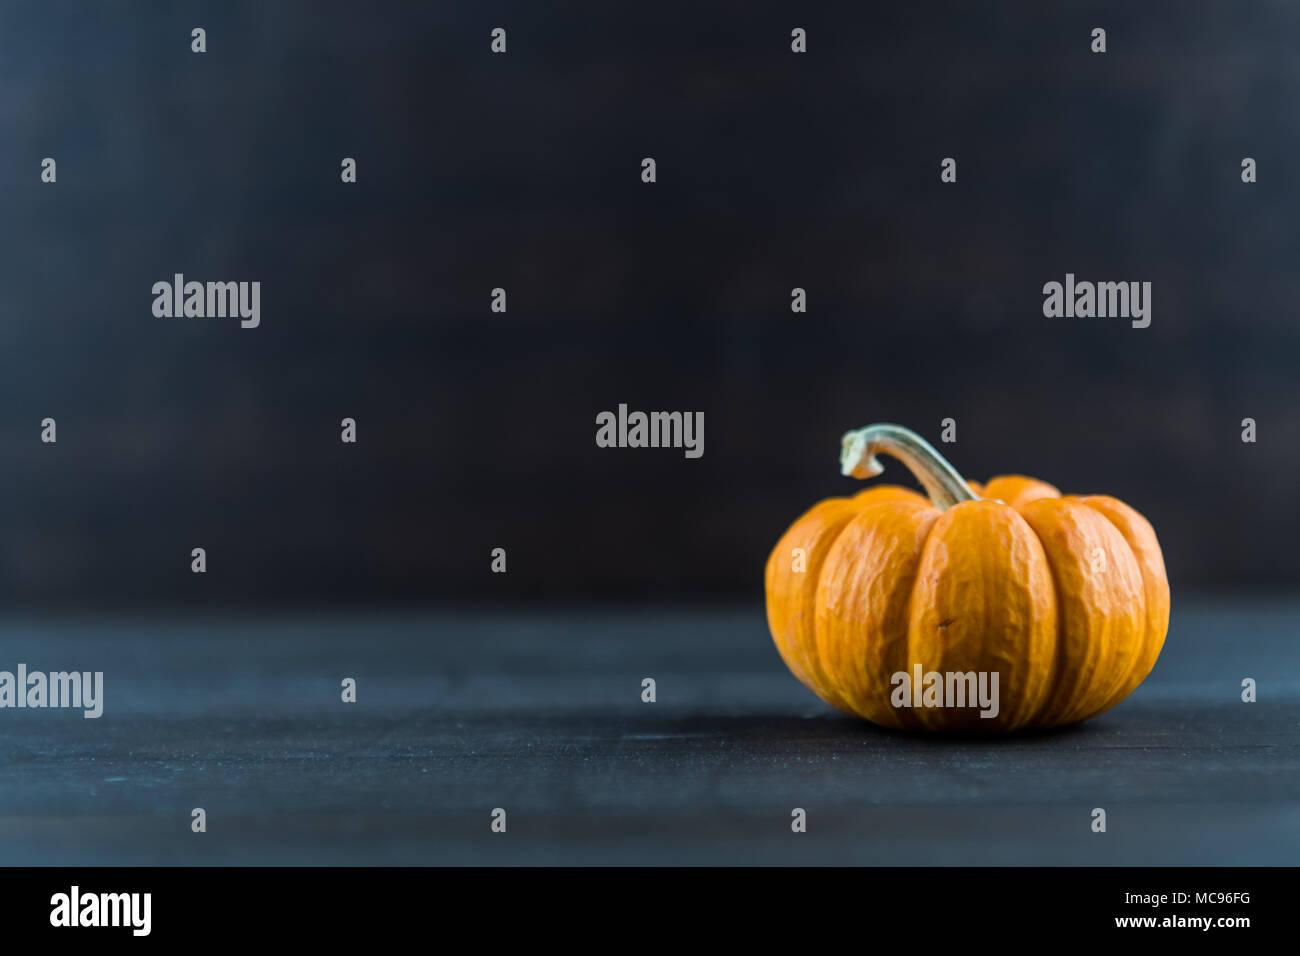 Texture of Jack Be Little Pumpkin on Dark Background - Stock Image